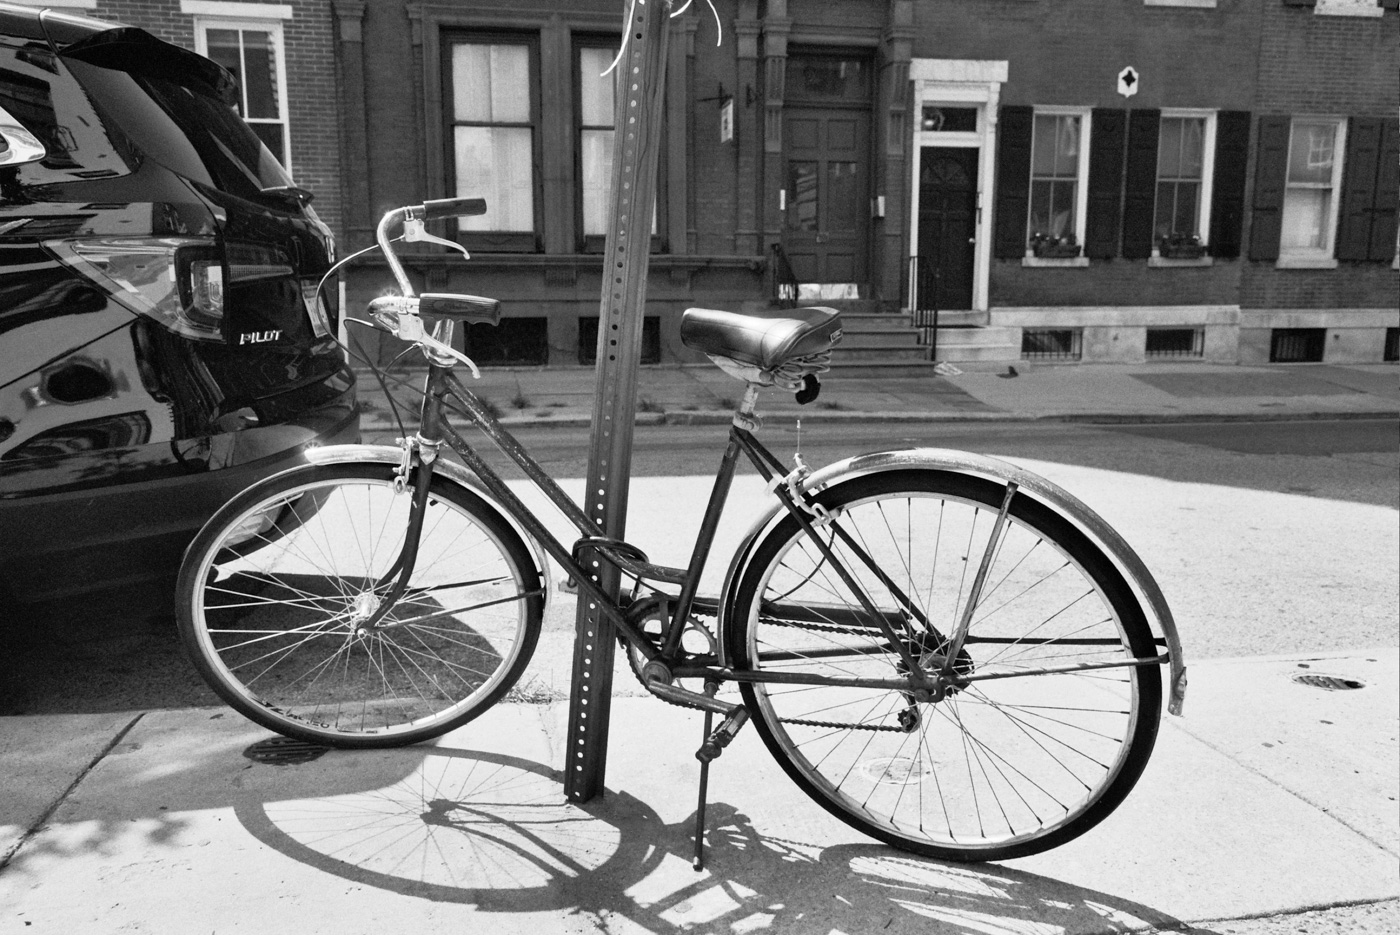 Philly Bike